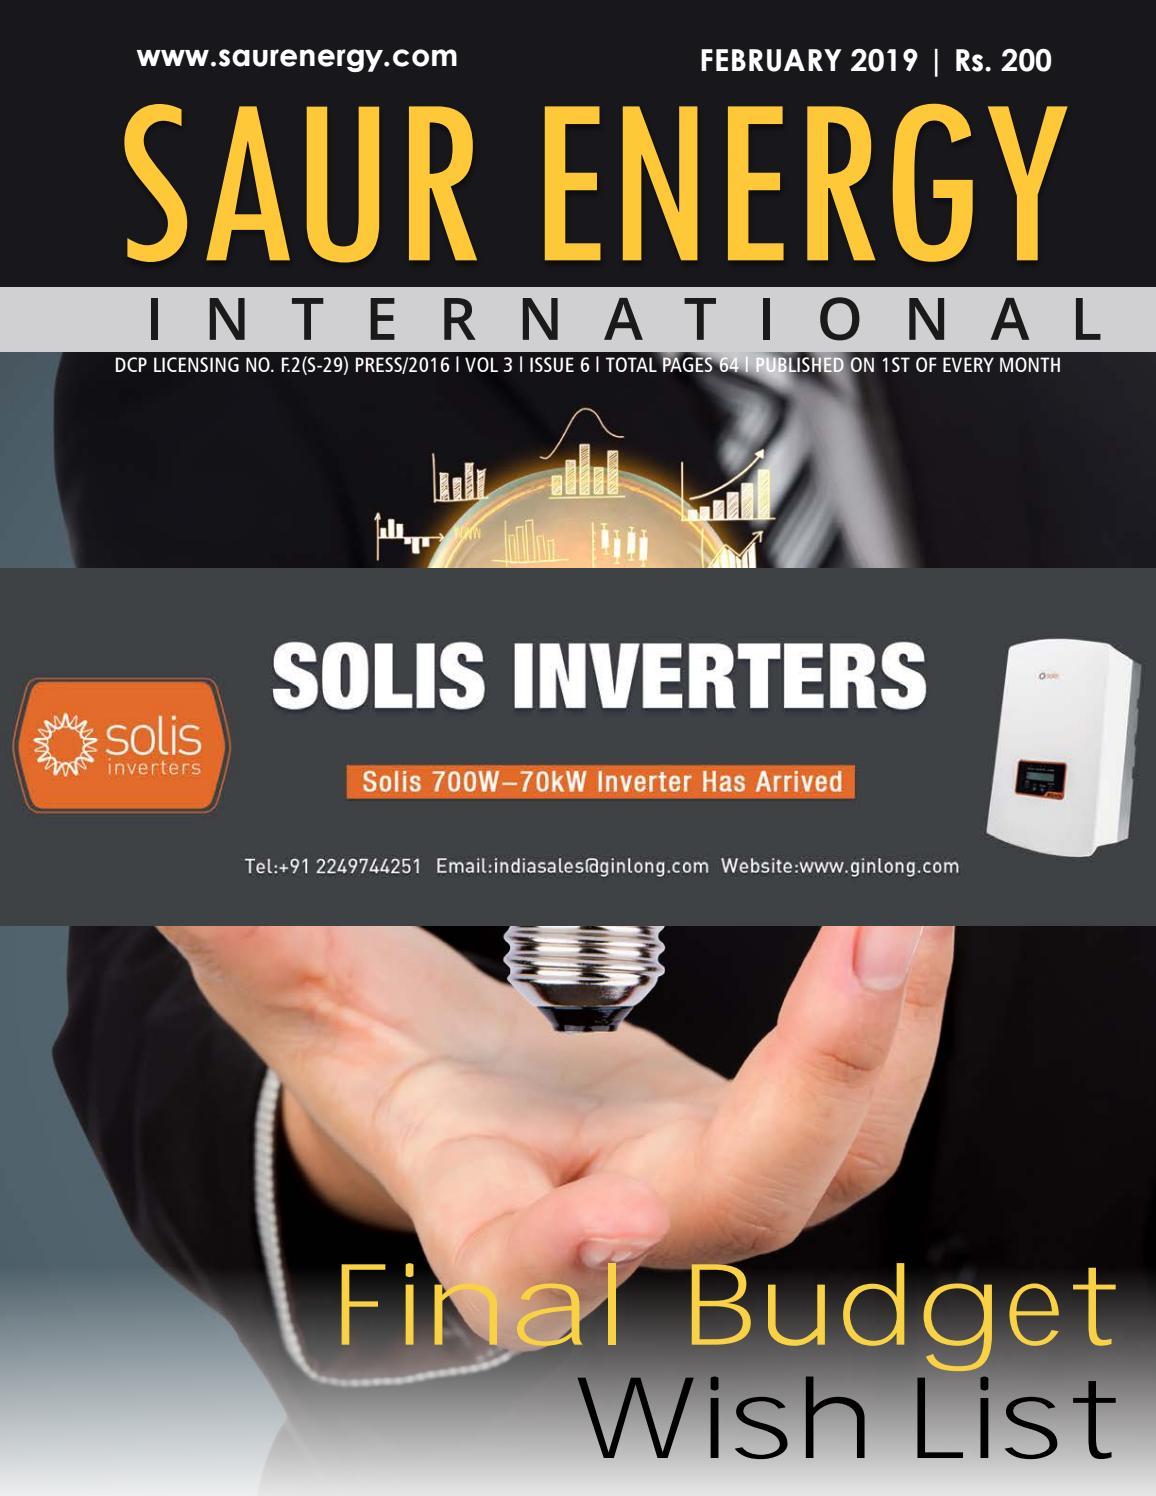 Saur Energy Magazine February 2019 by Saur Energy International - issuu